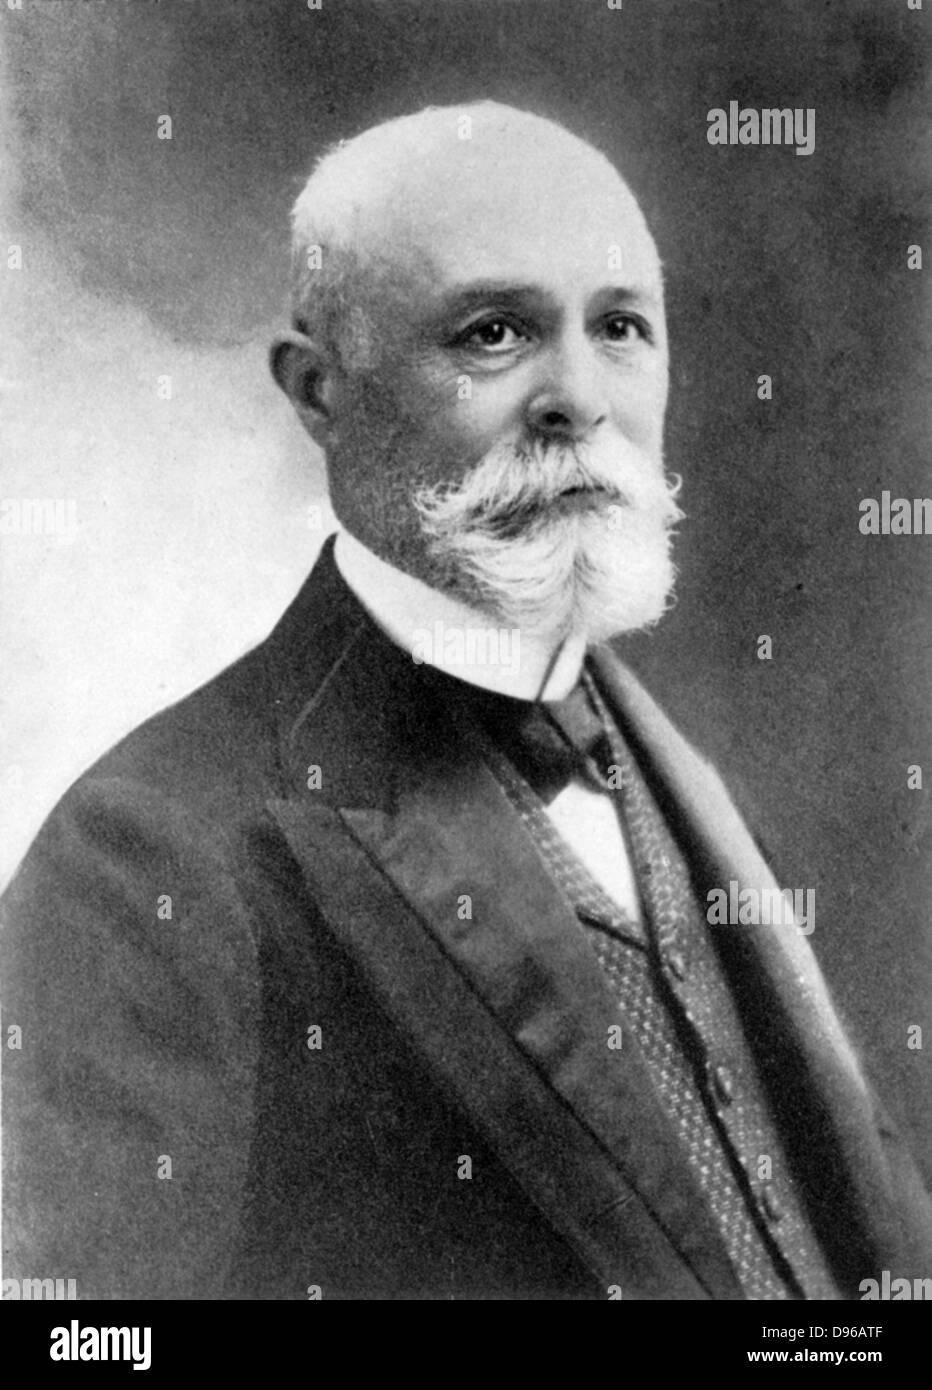 (Antoine) Henri Becquerel (1852-1908) French physicist; Fluorescence: Radioactivity; shared 1903 Nobel prize for - Stock Image